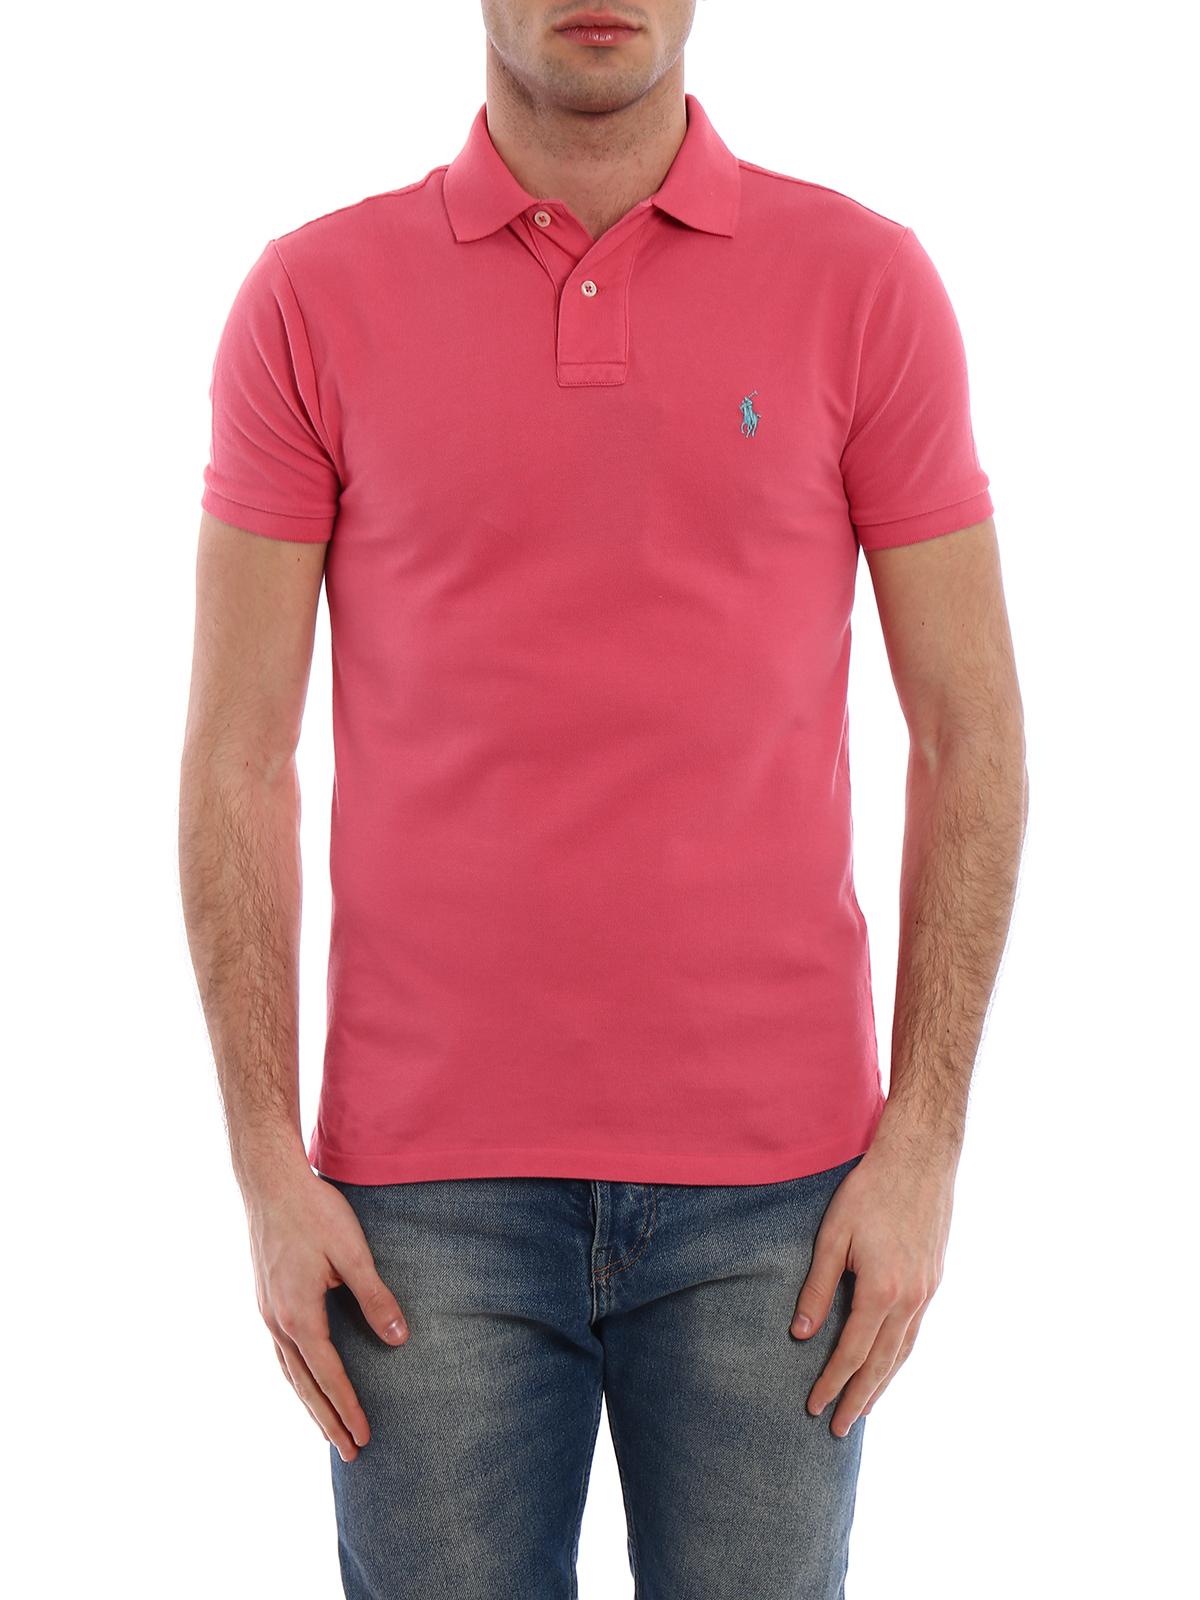 angemessener Preis autorisierte Website Großhandel Polo Ralph Lauren - Poloshirt - Slim Fit - Poloshirts ...